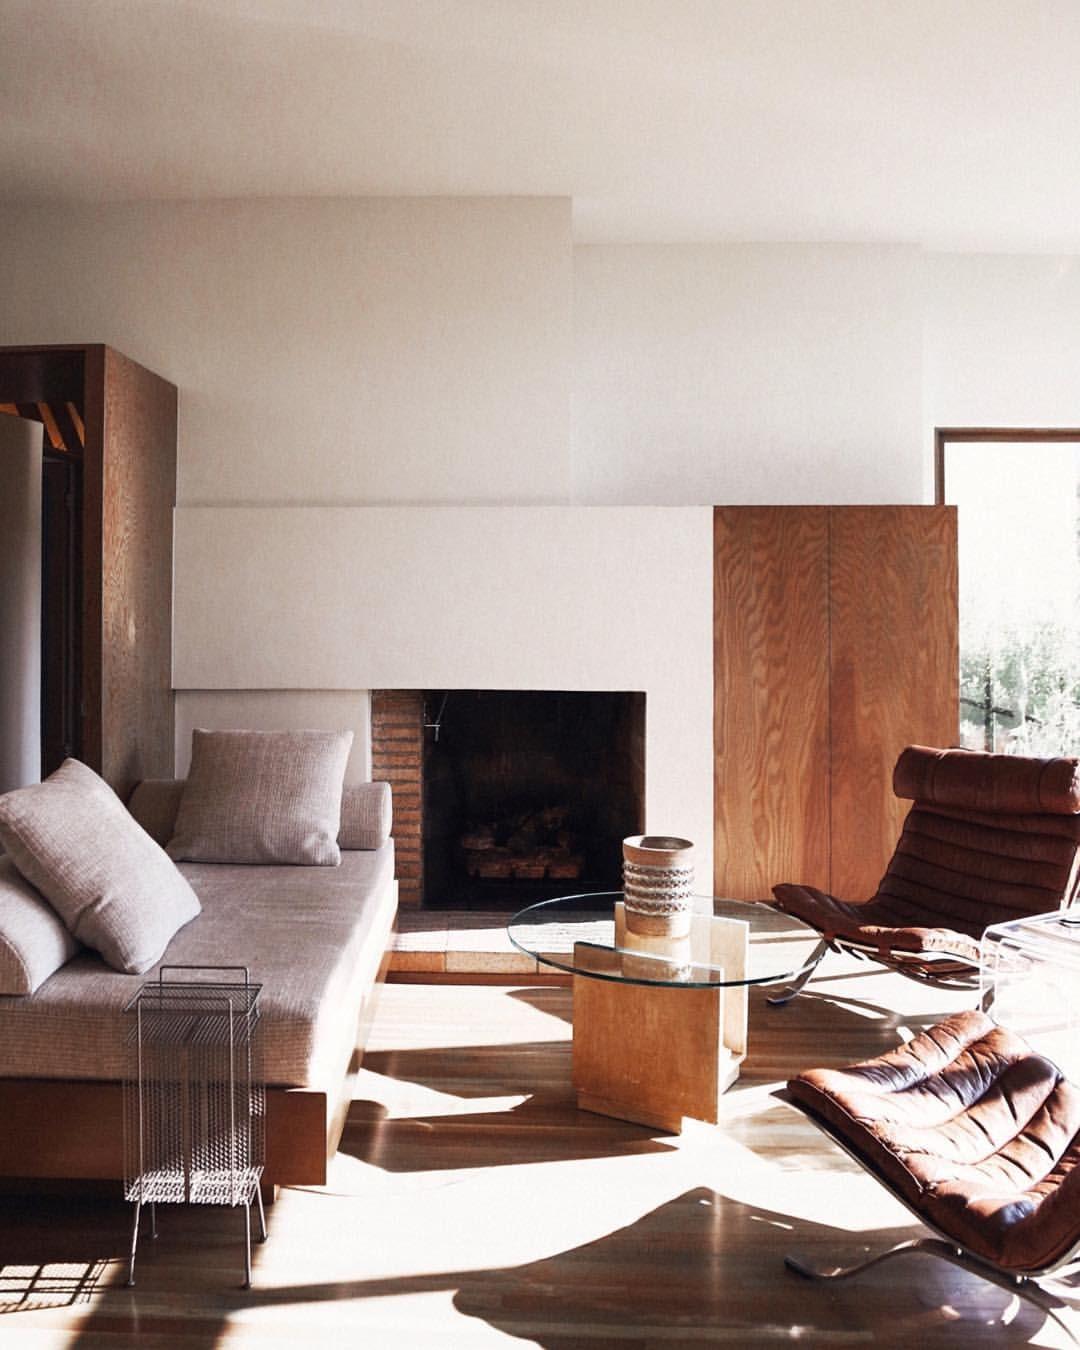 Mid century modern is the most popular interior